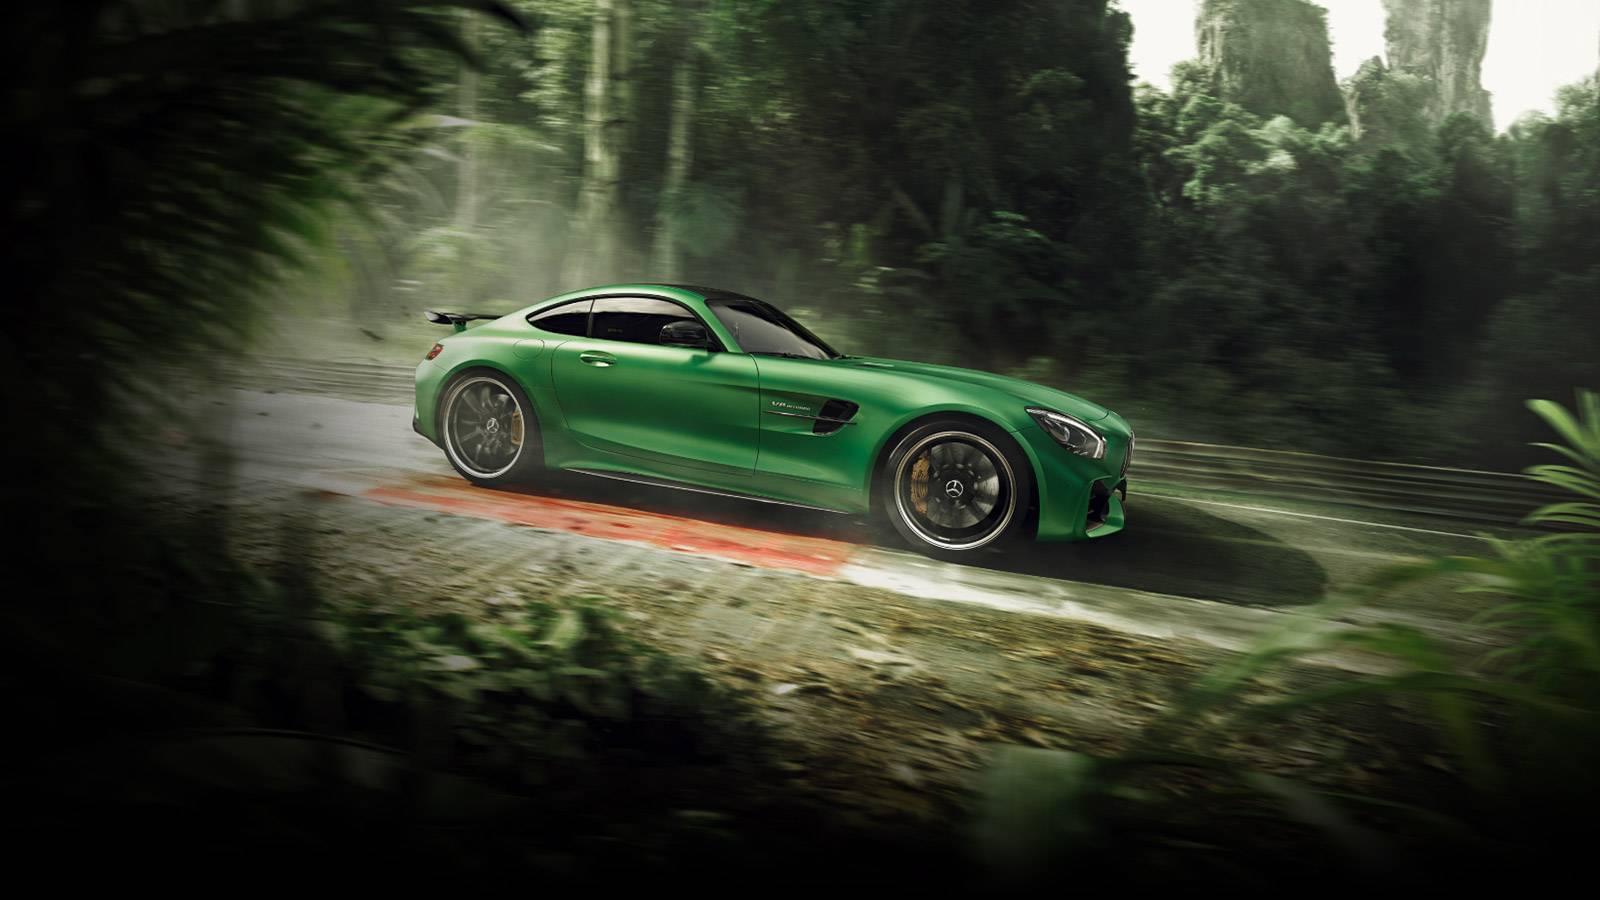 AMG Green